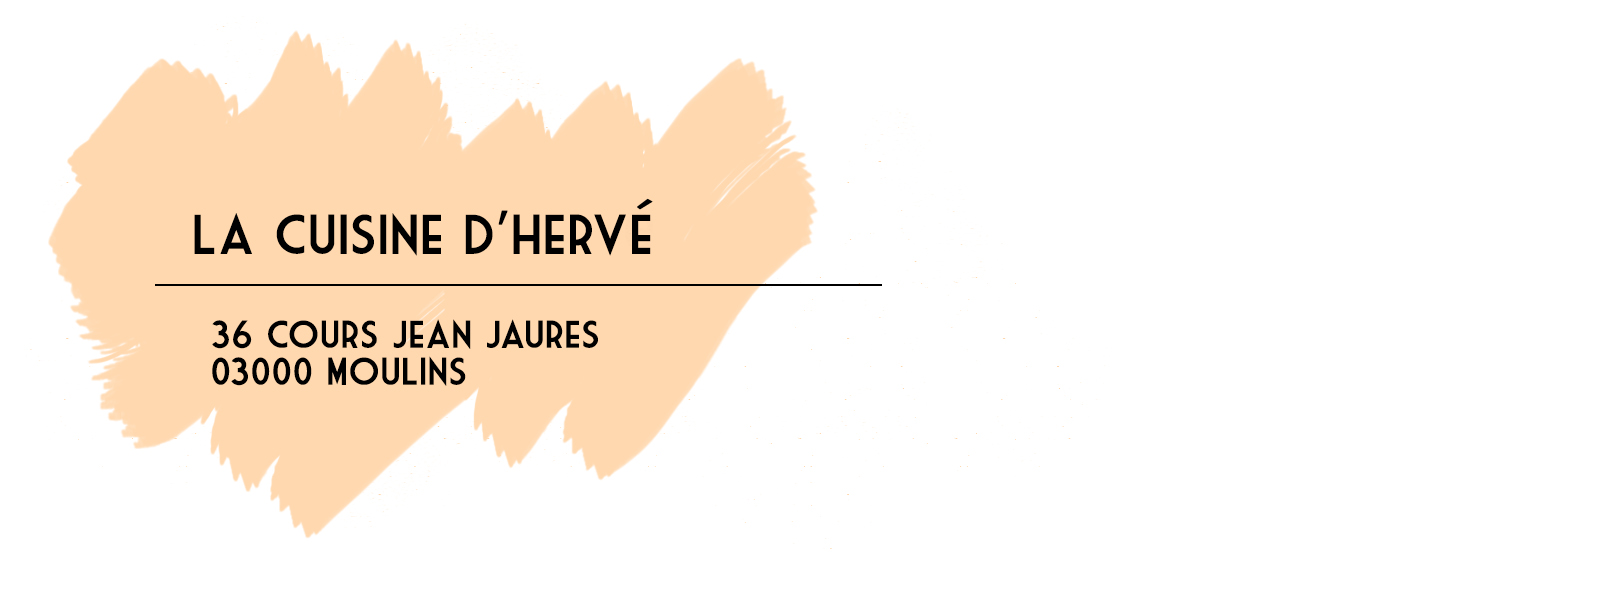 Herve-Titrecopie